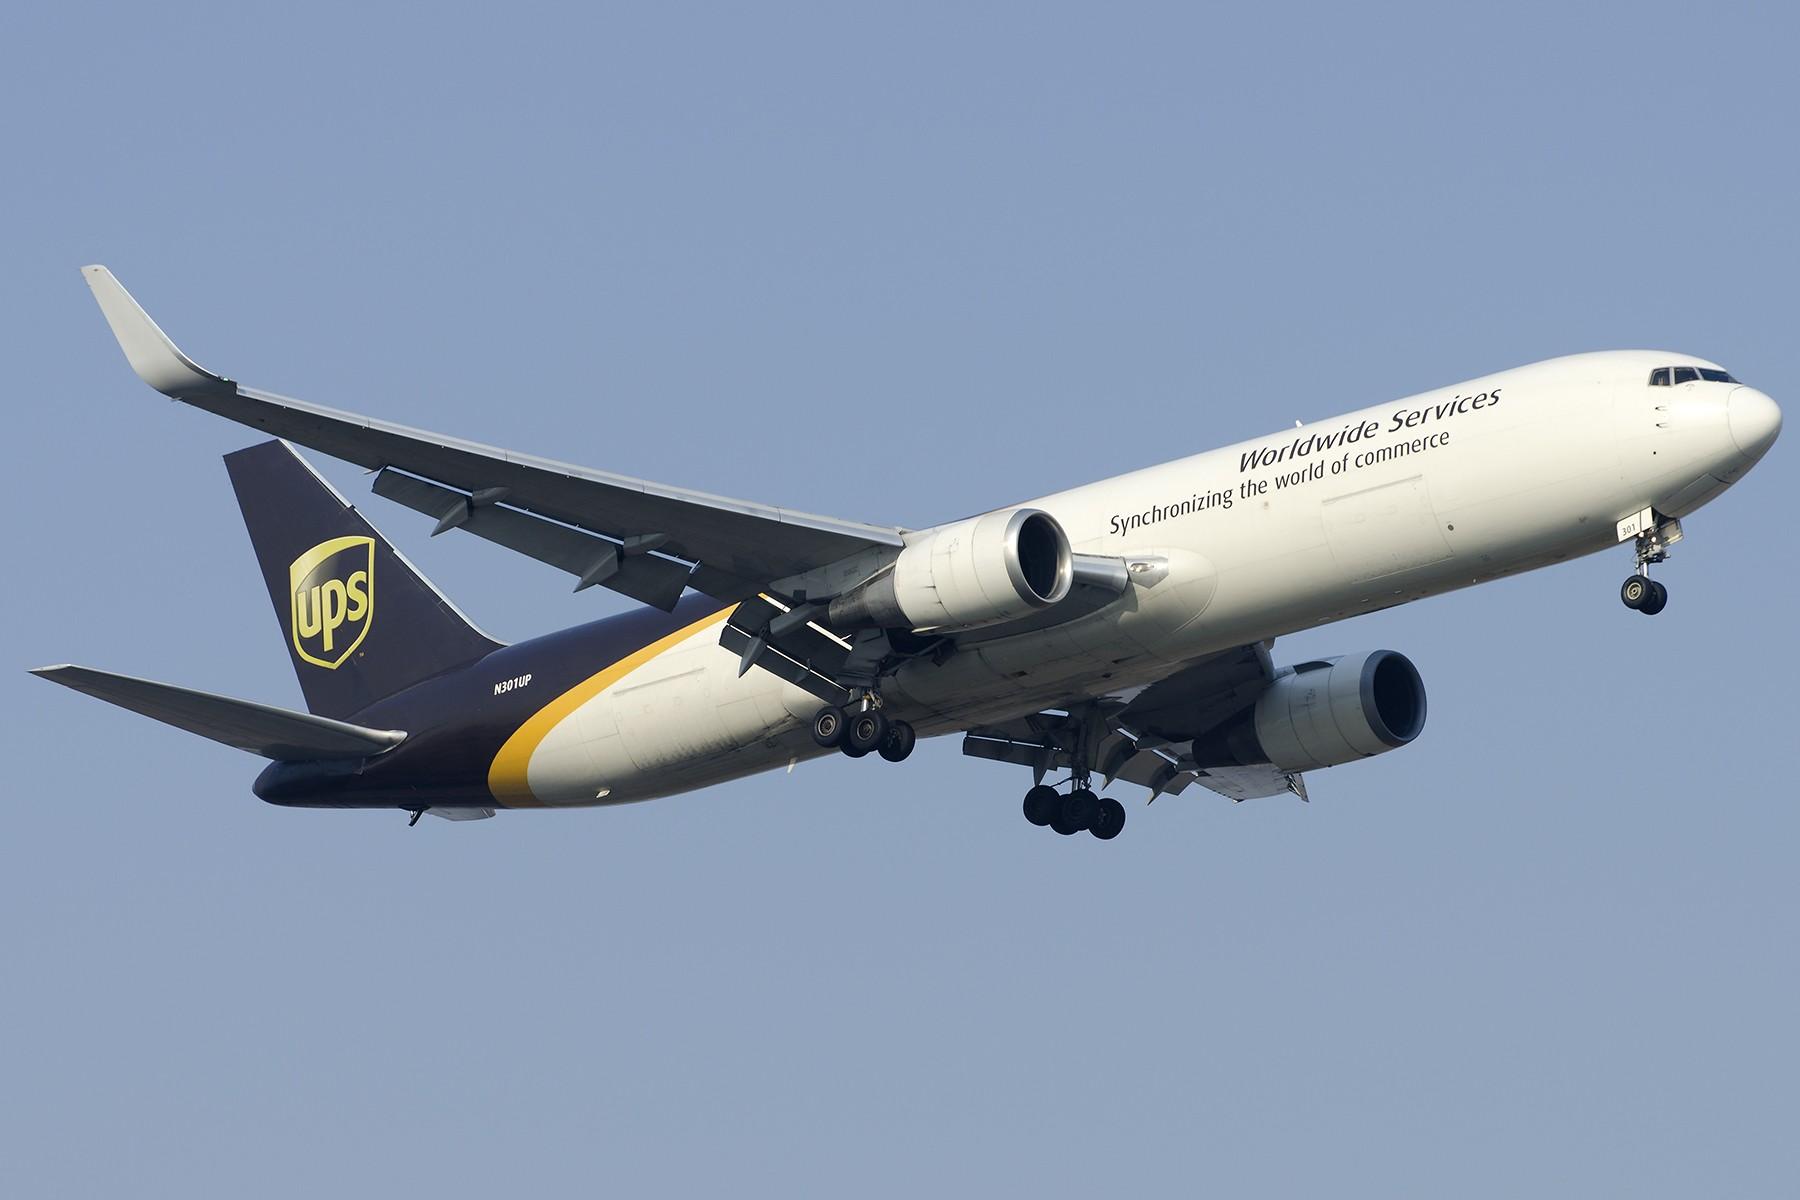 Re:[原创][原创]【PVG】好久没发图了,一堆库存(2)午后 BOEING 767-300ER N301UP 中国上海浦东国际机场